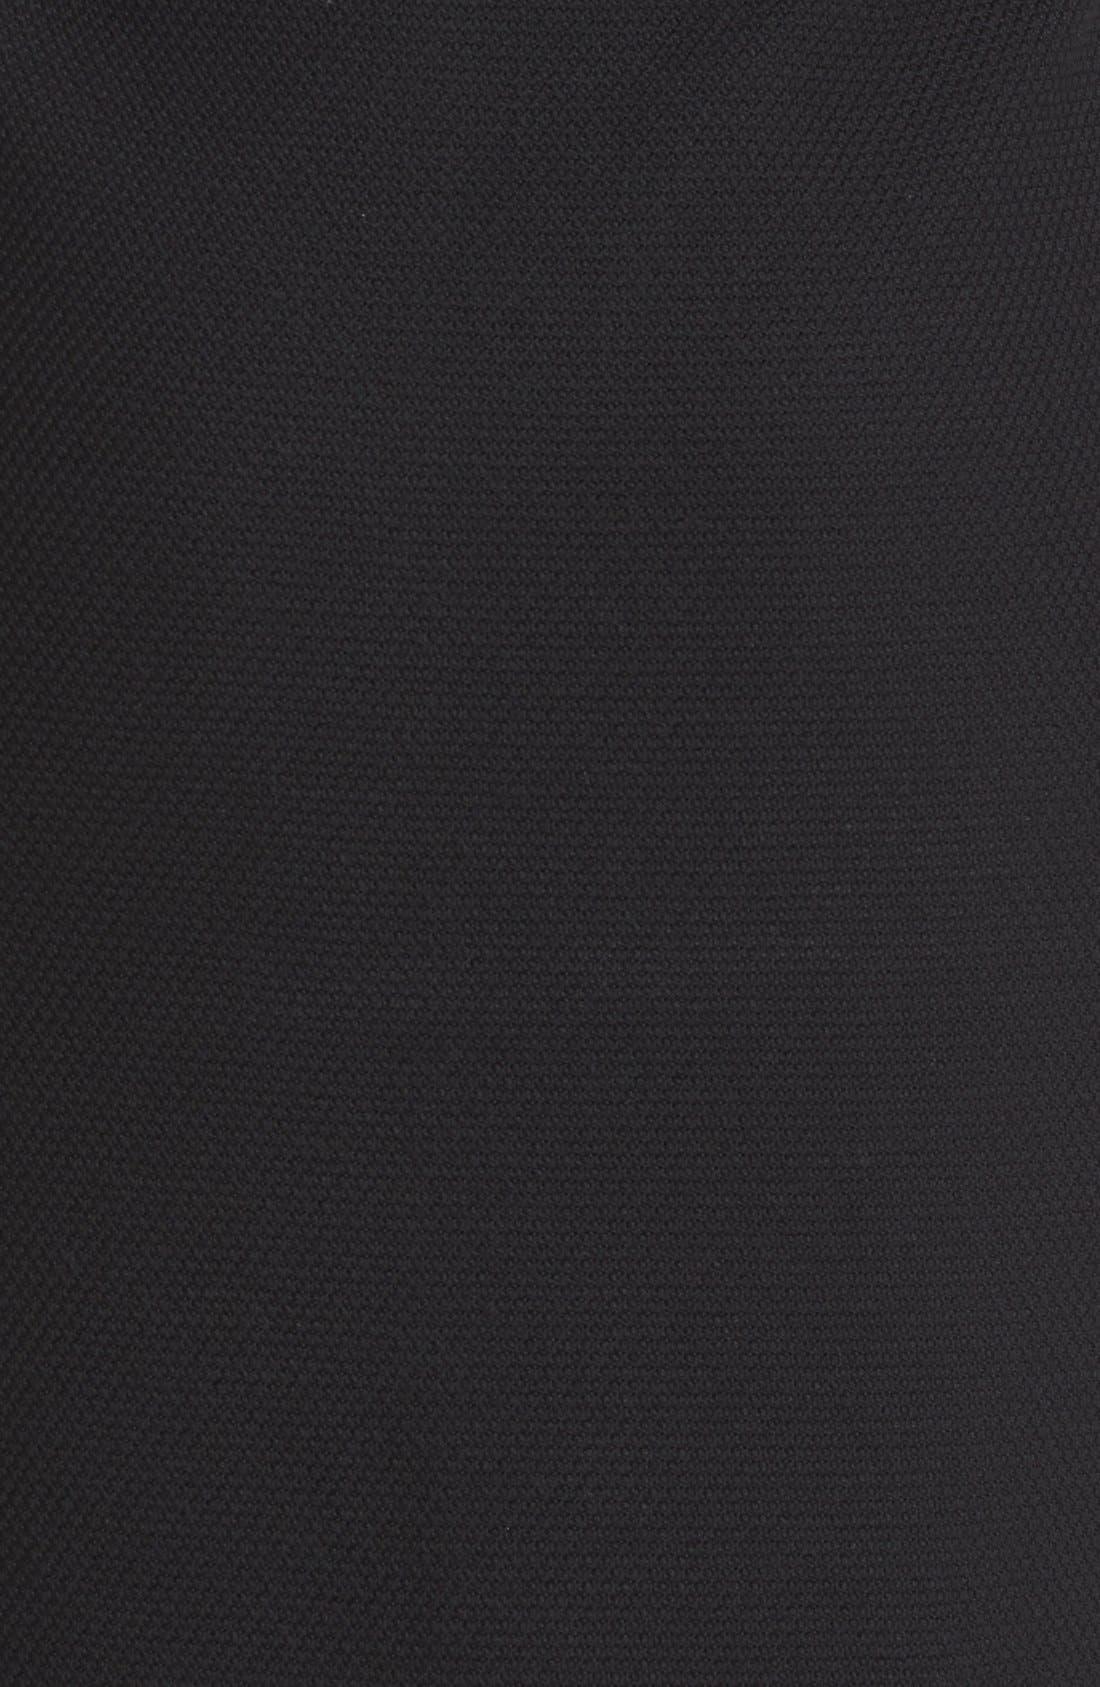 Micro Bouclé Pencil Skirt,                             Alternate thumbnail 3, color,                             Caviar